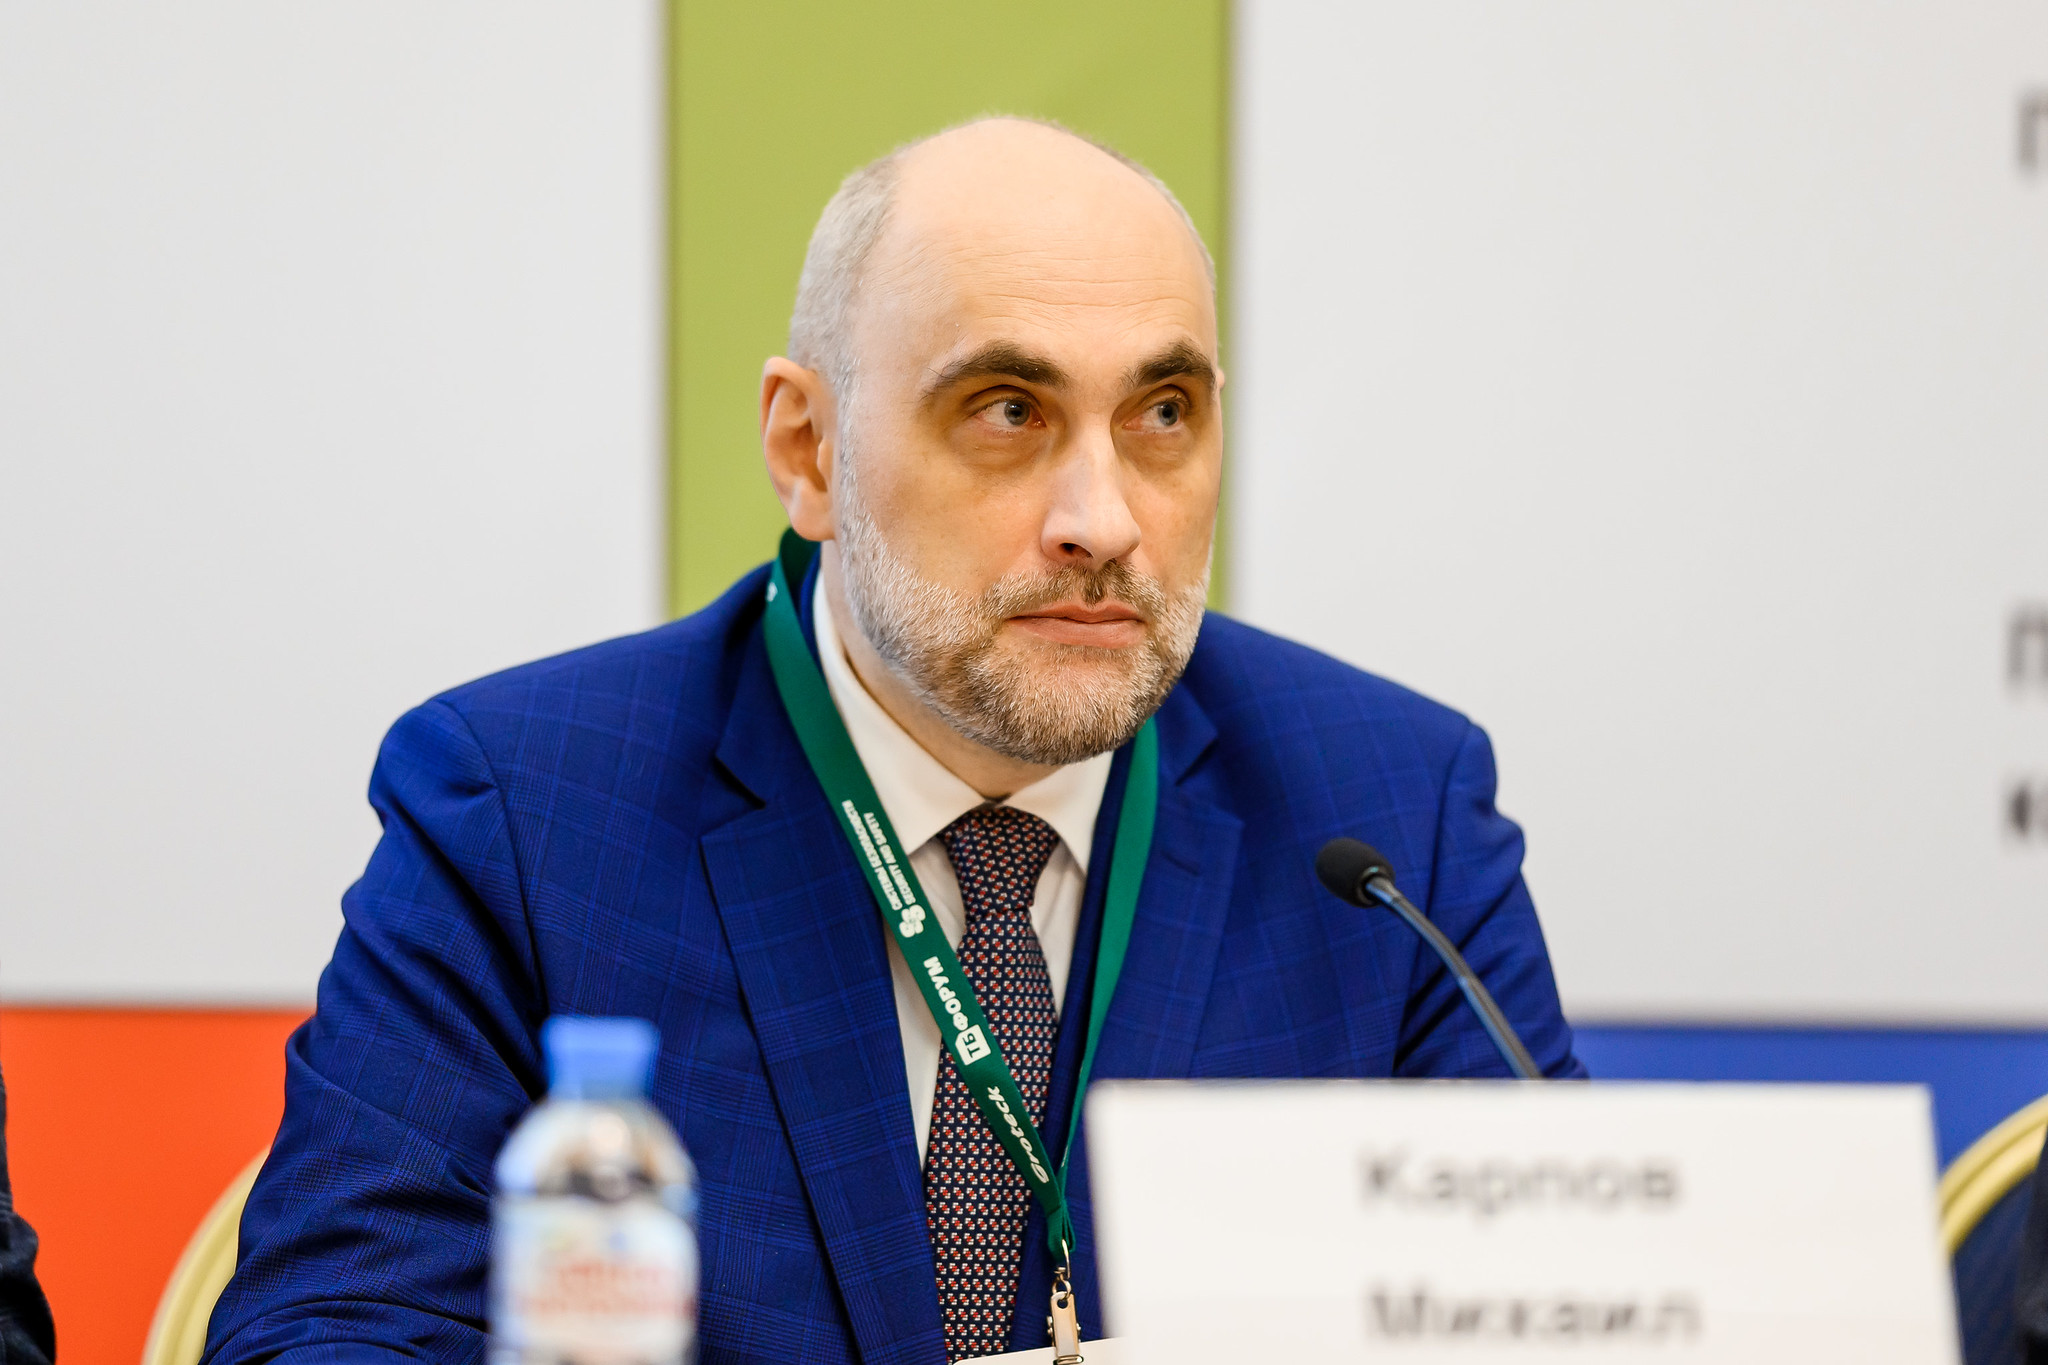 Михаил Карпов, Главгосэкспертиза